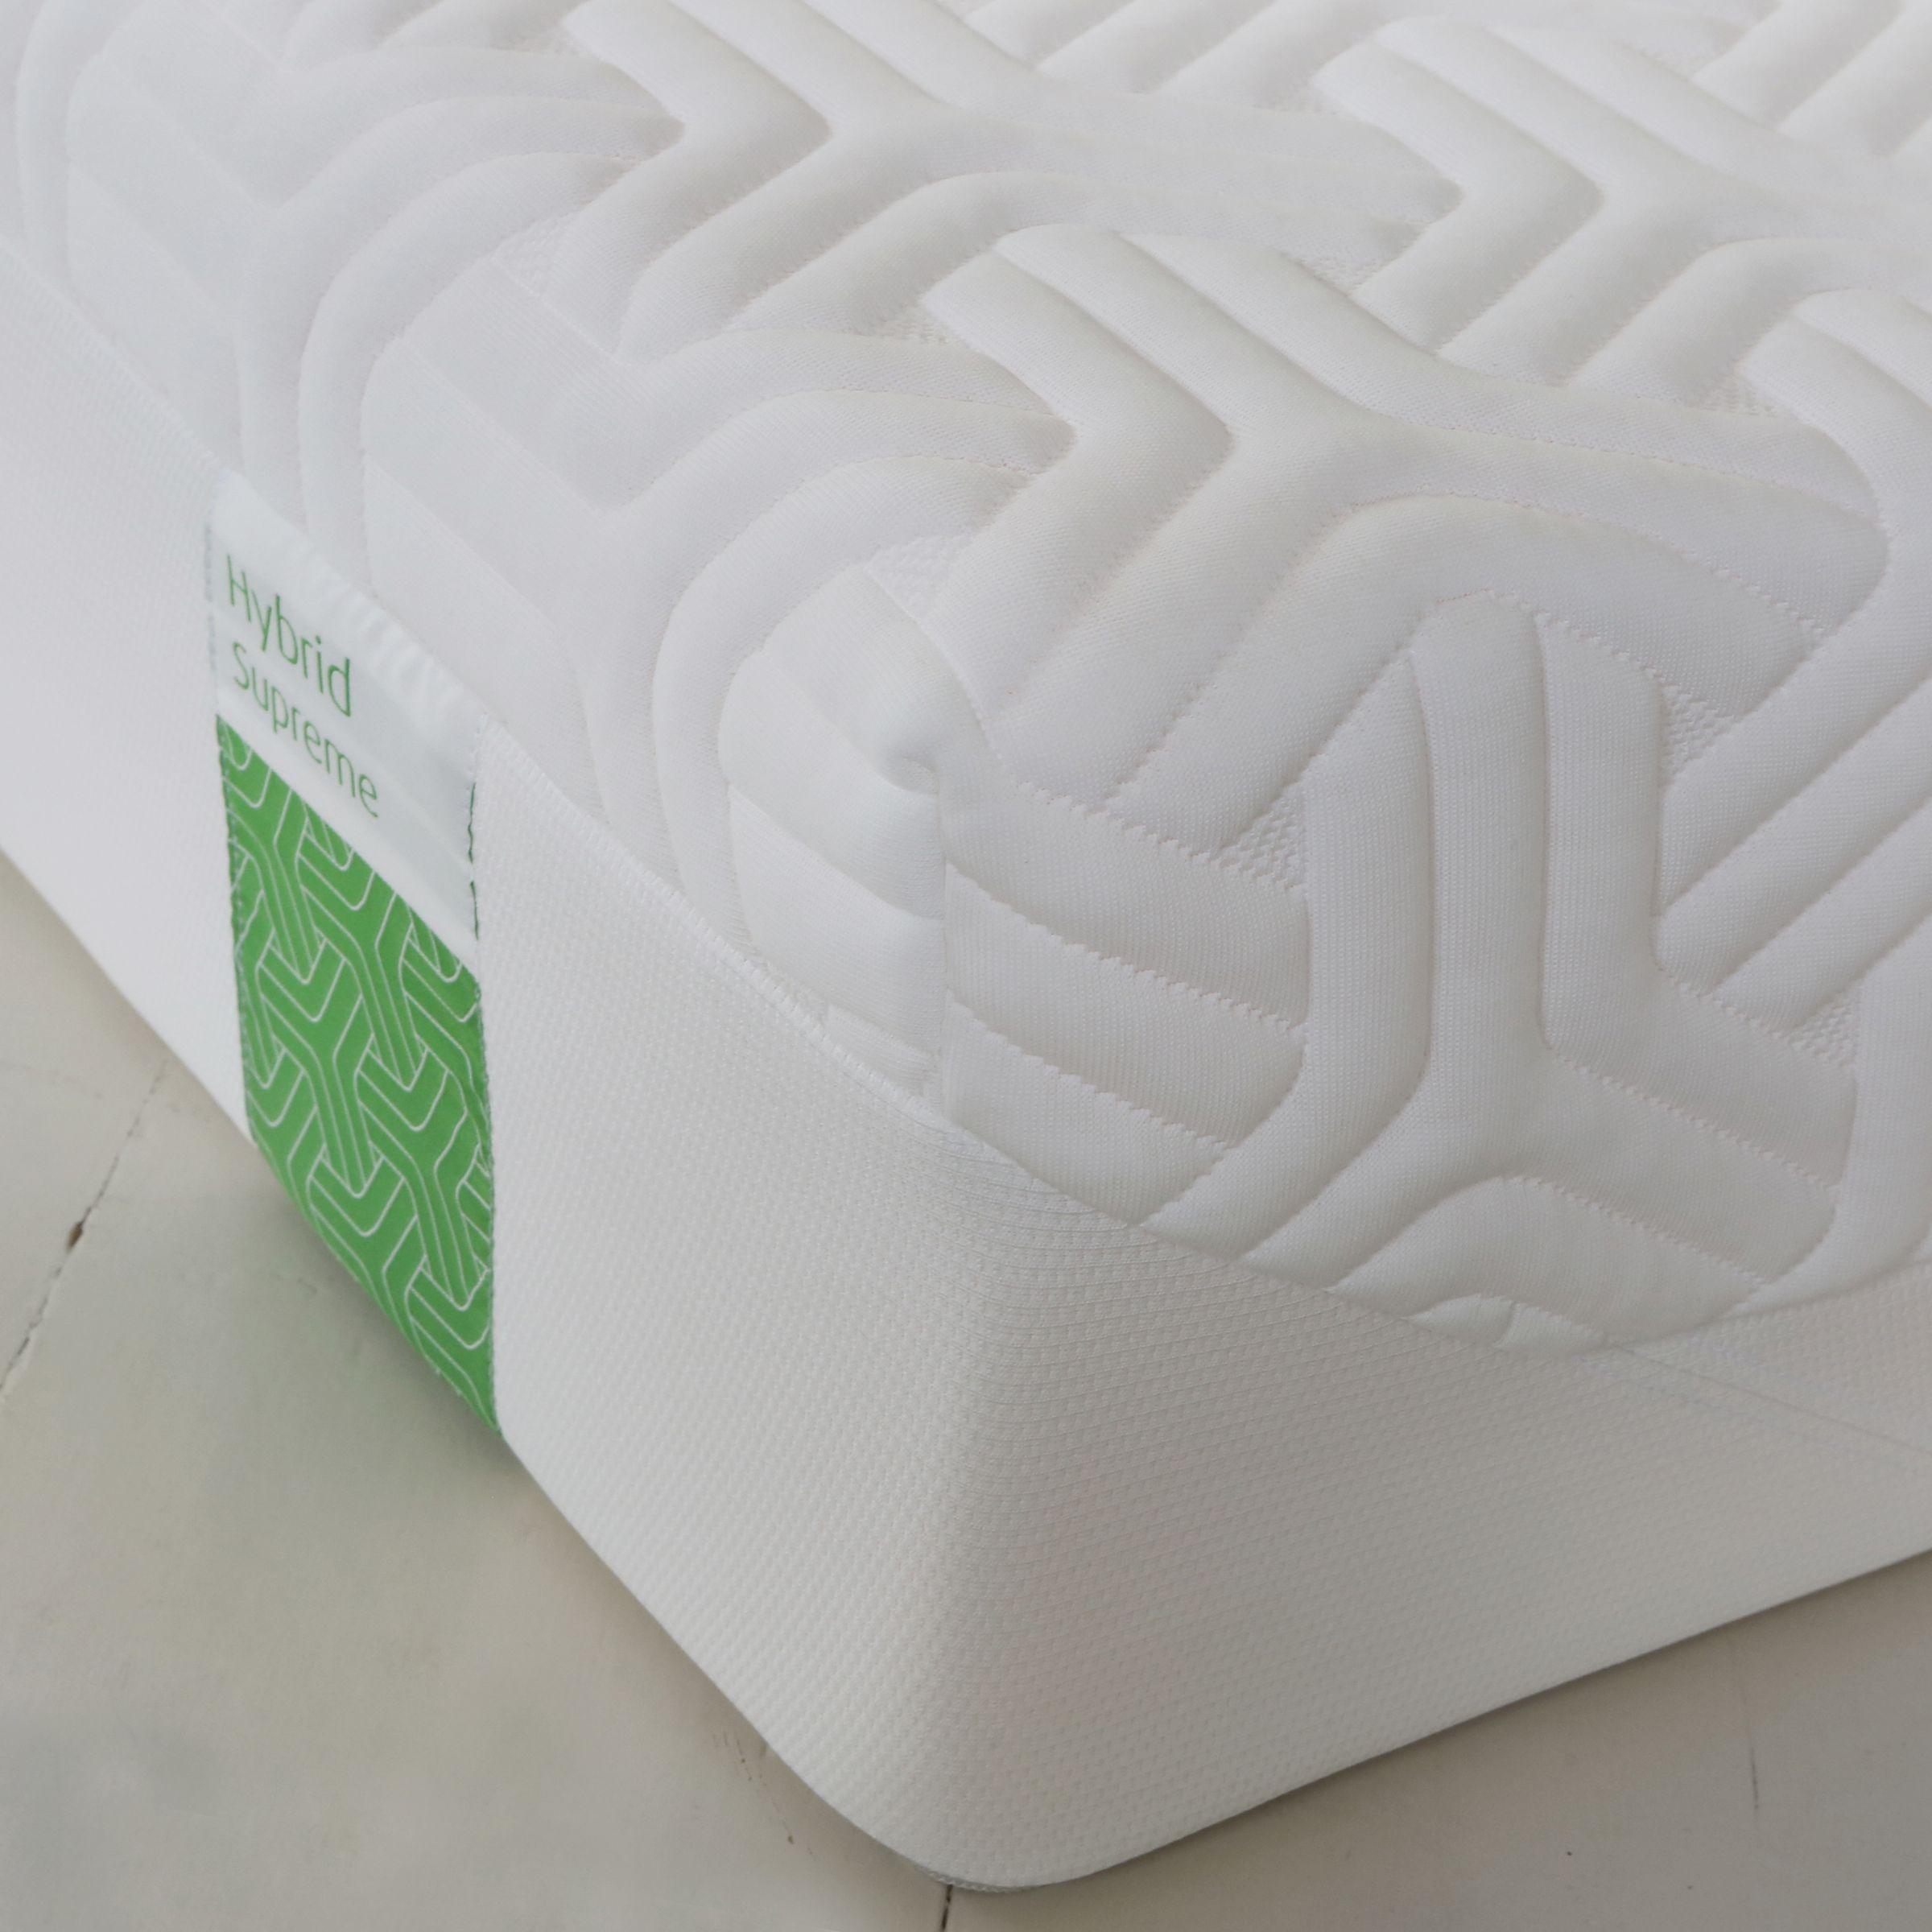 Tempur Tempur Hybrid Supreme Pocket Spring Memory Foam Mattress, Double